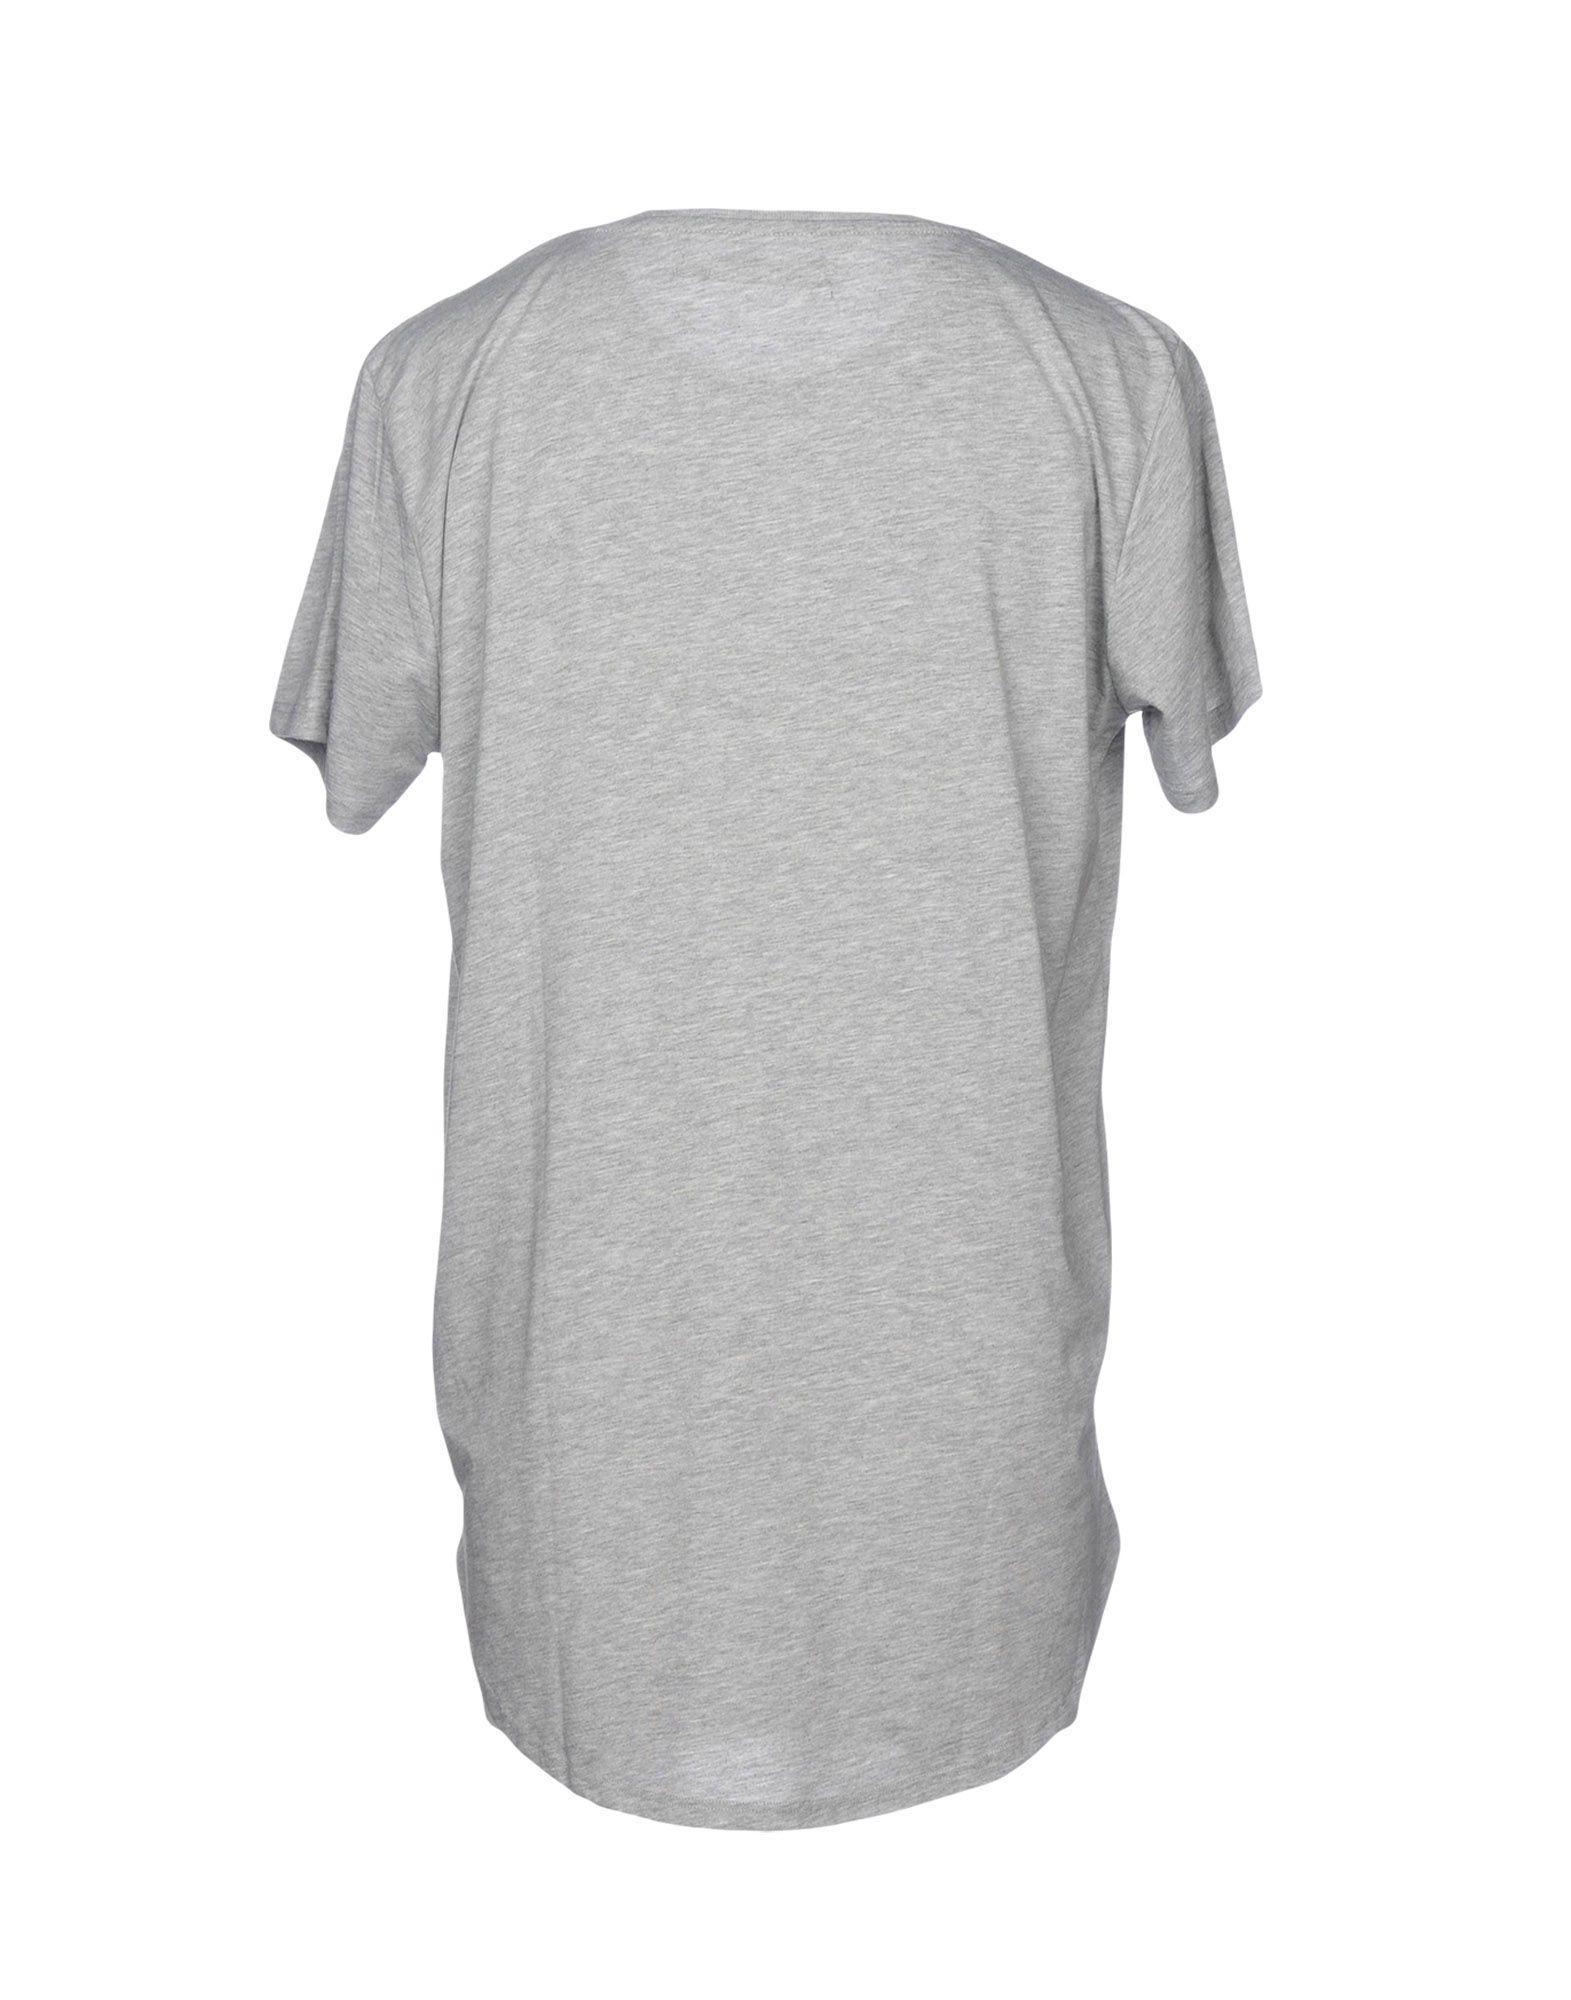 Lyst Junkyard T shirt in Gray for Men